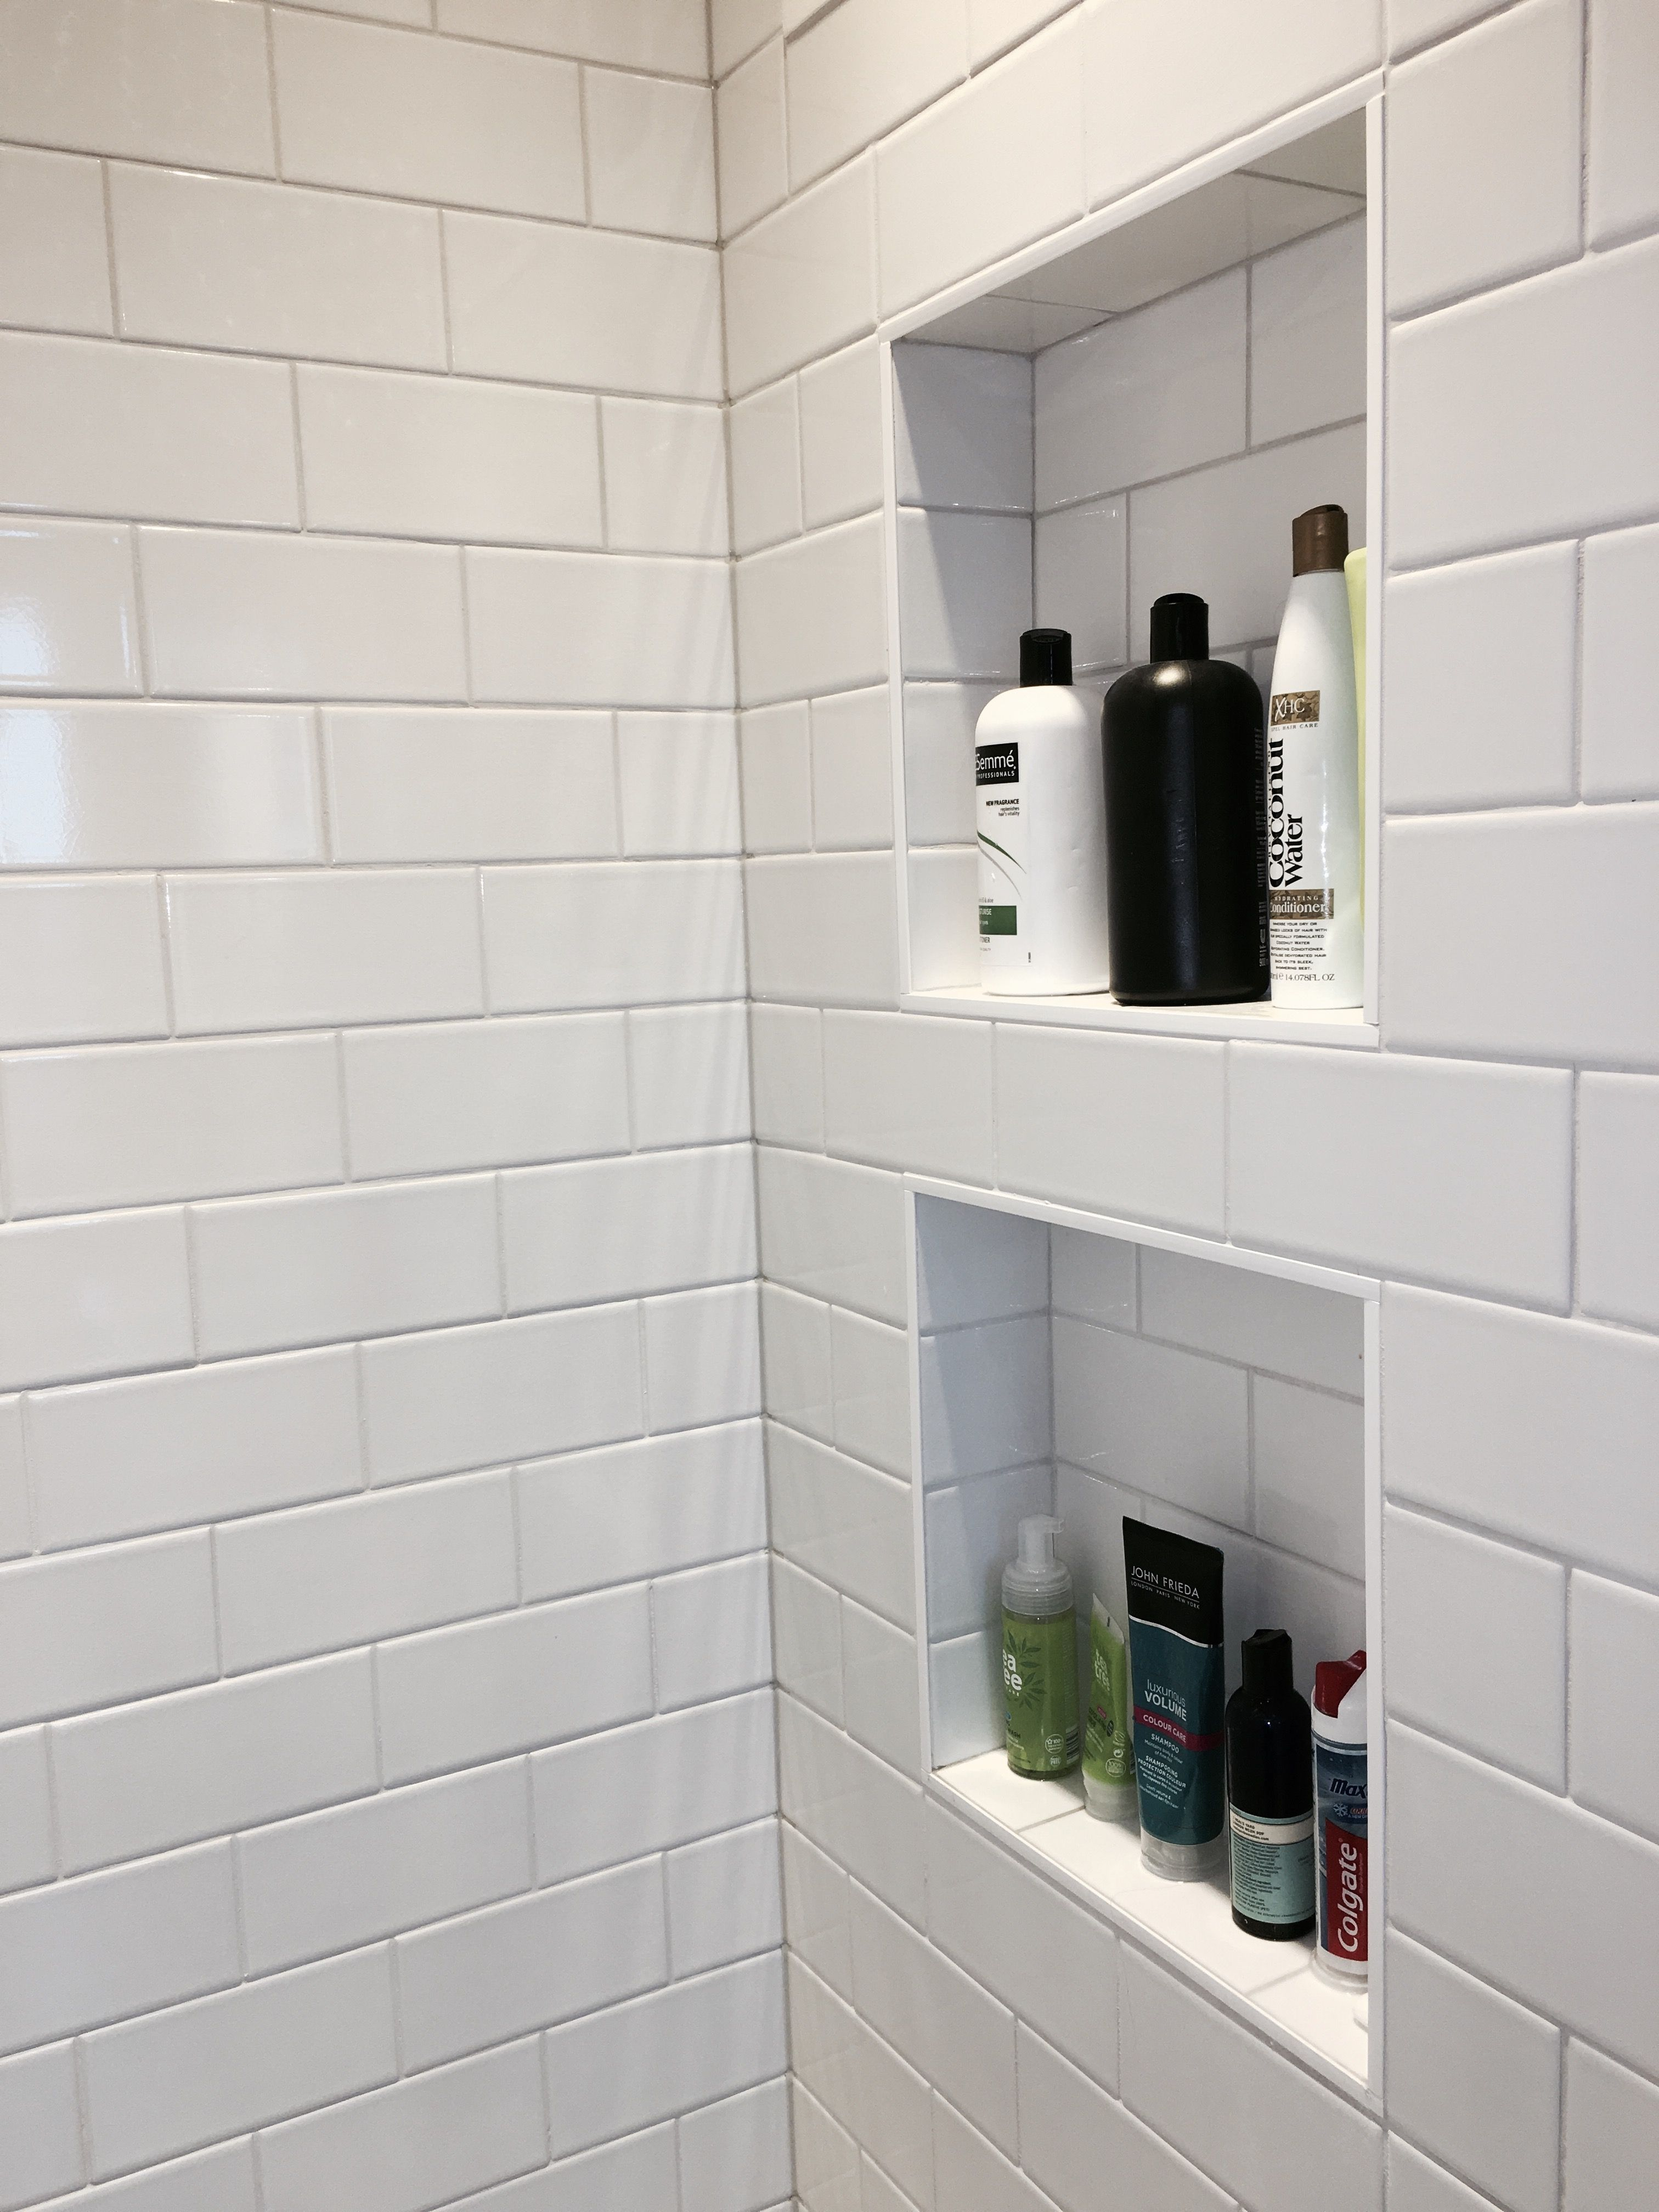 Pin By Brooke Gonzales On Office Bathroom In 2020 Shower Room Office Bathroom Cement Floor